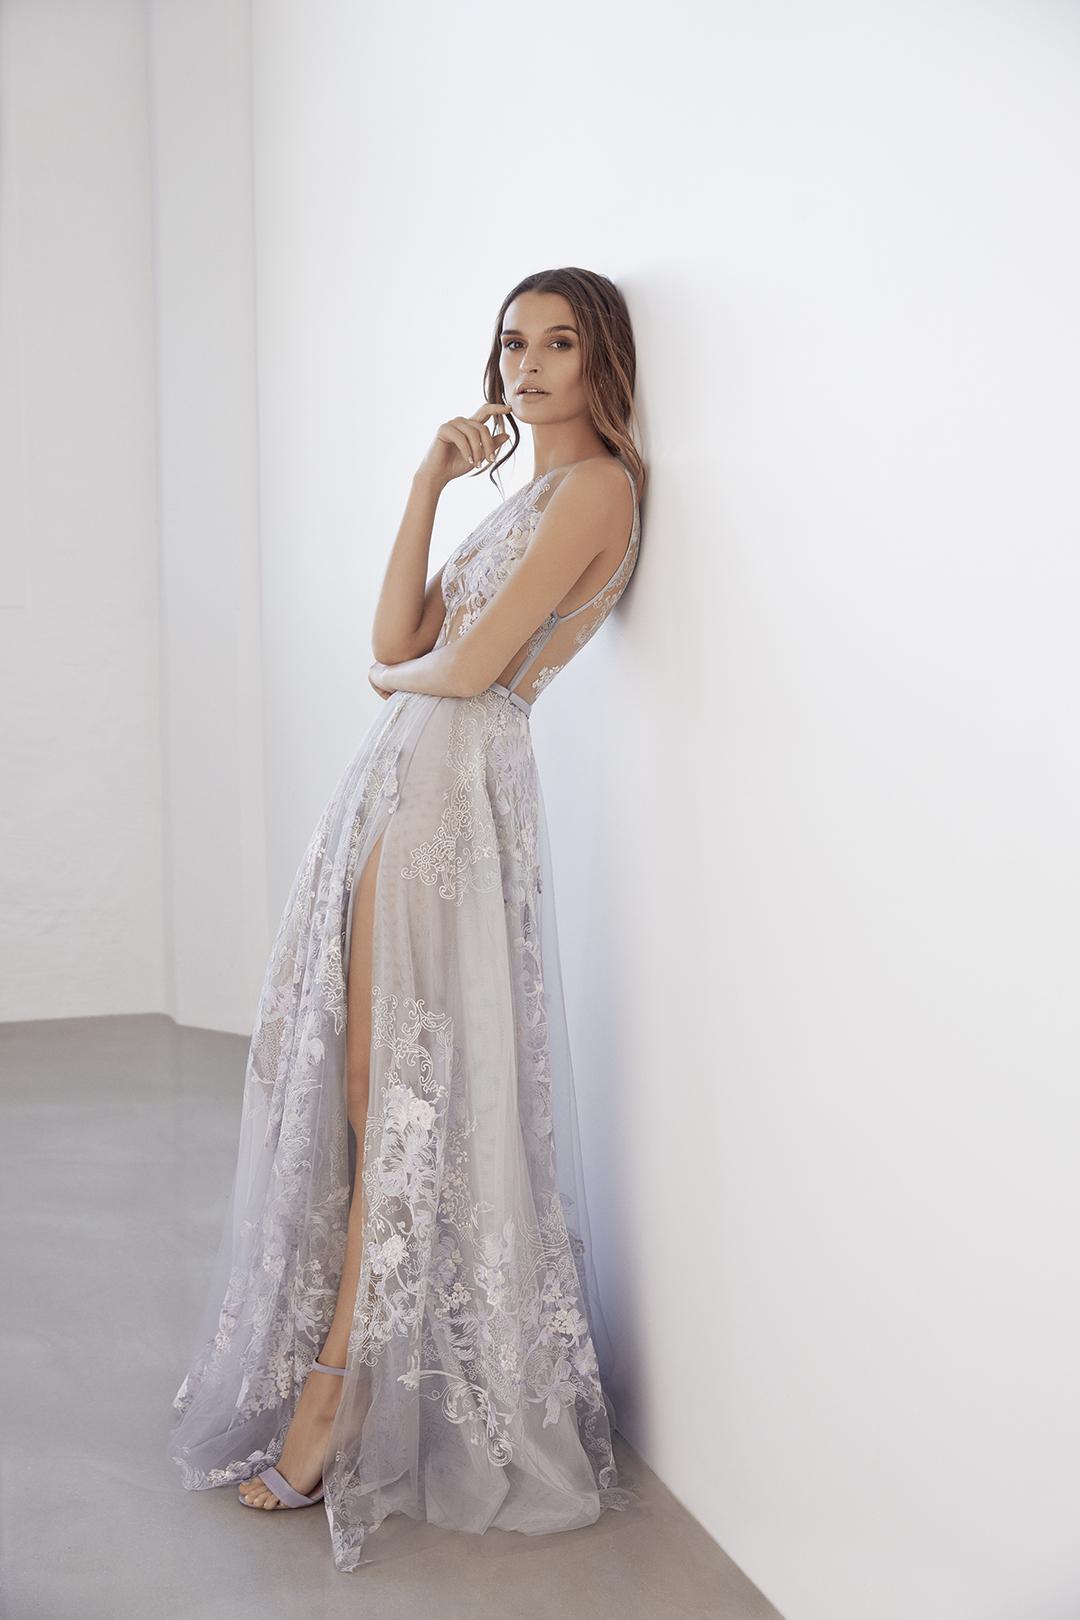 Dress main 2x 1550236854